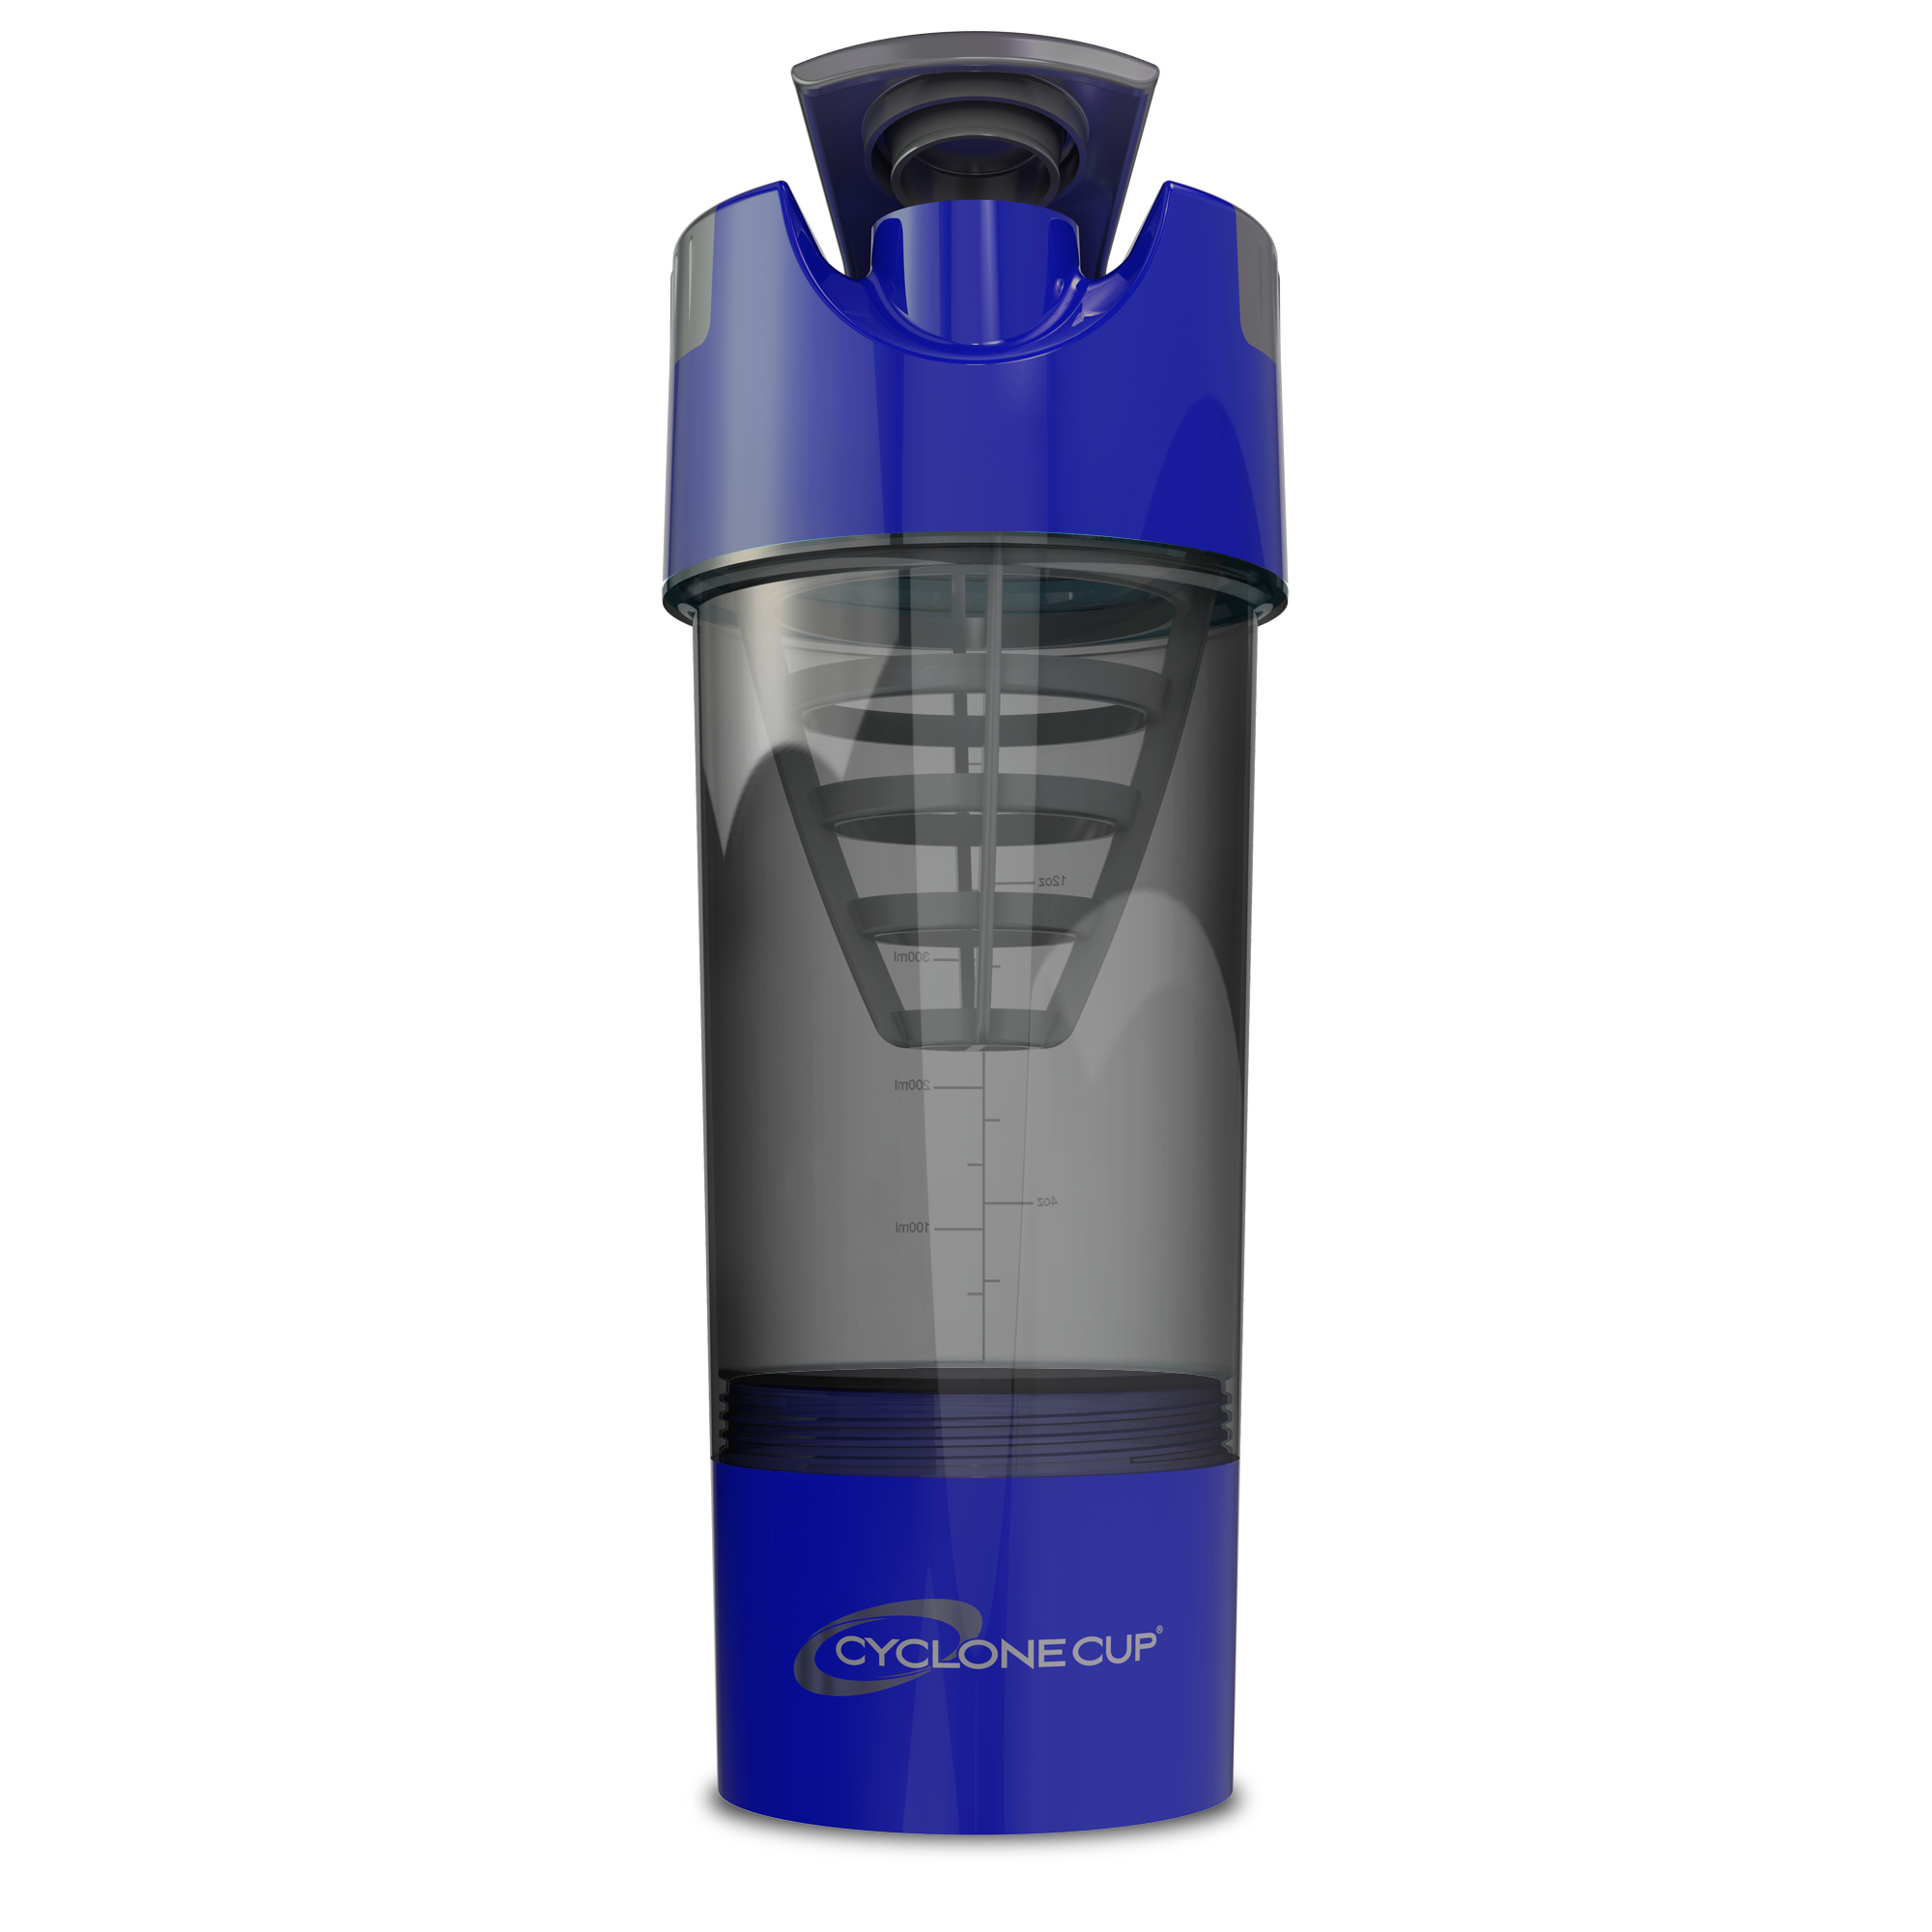 Cyclone Cup Shaker, Blue - 20 oz - Walmart.com